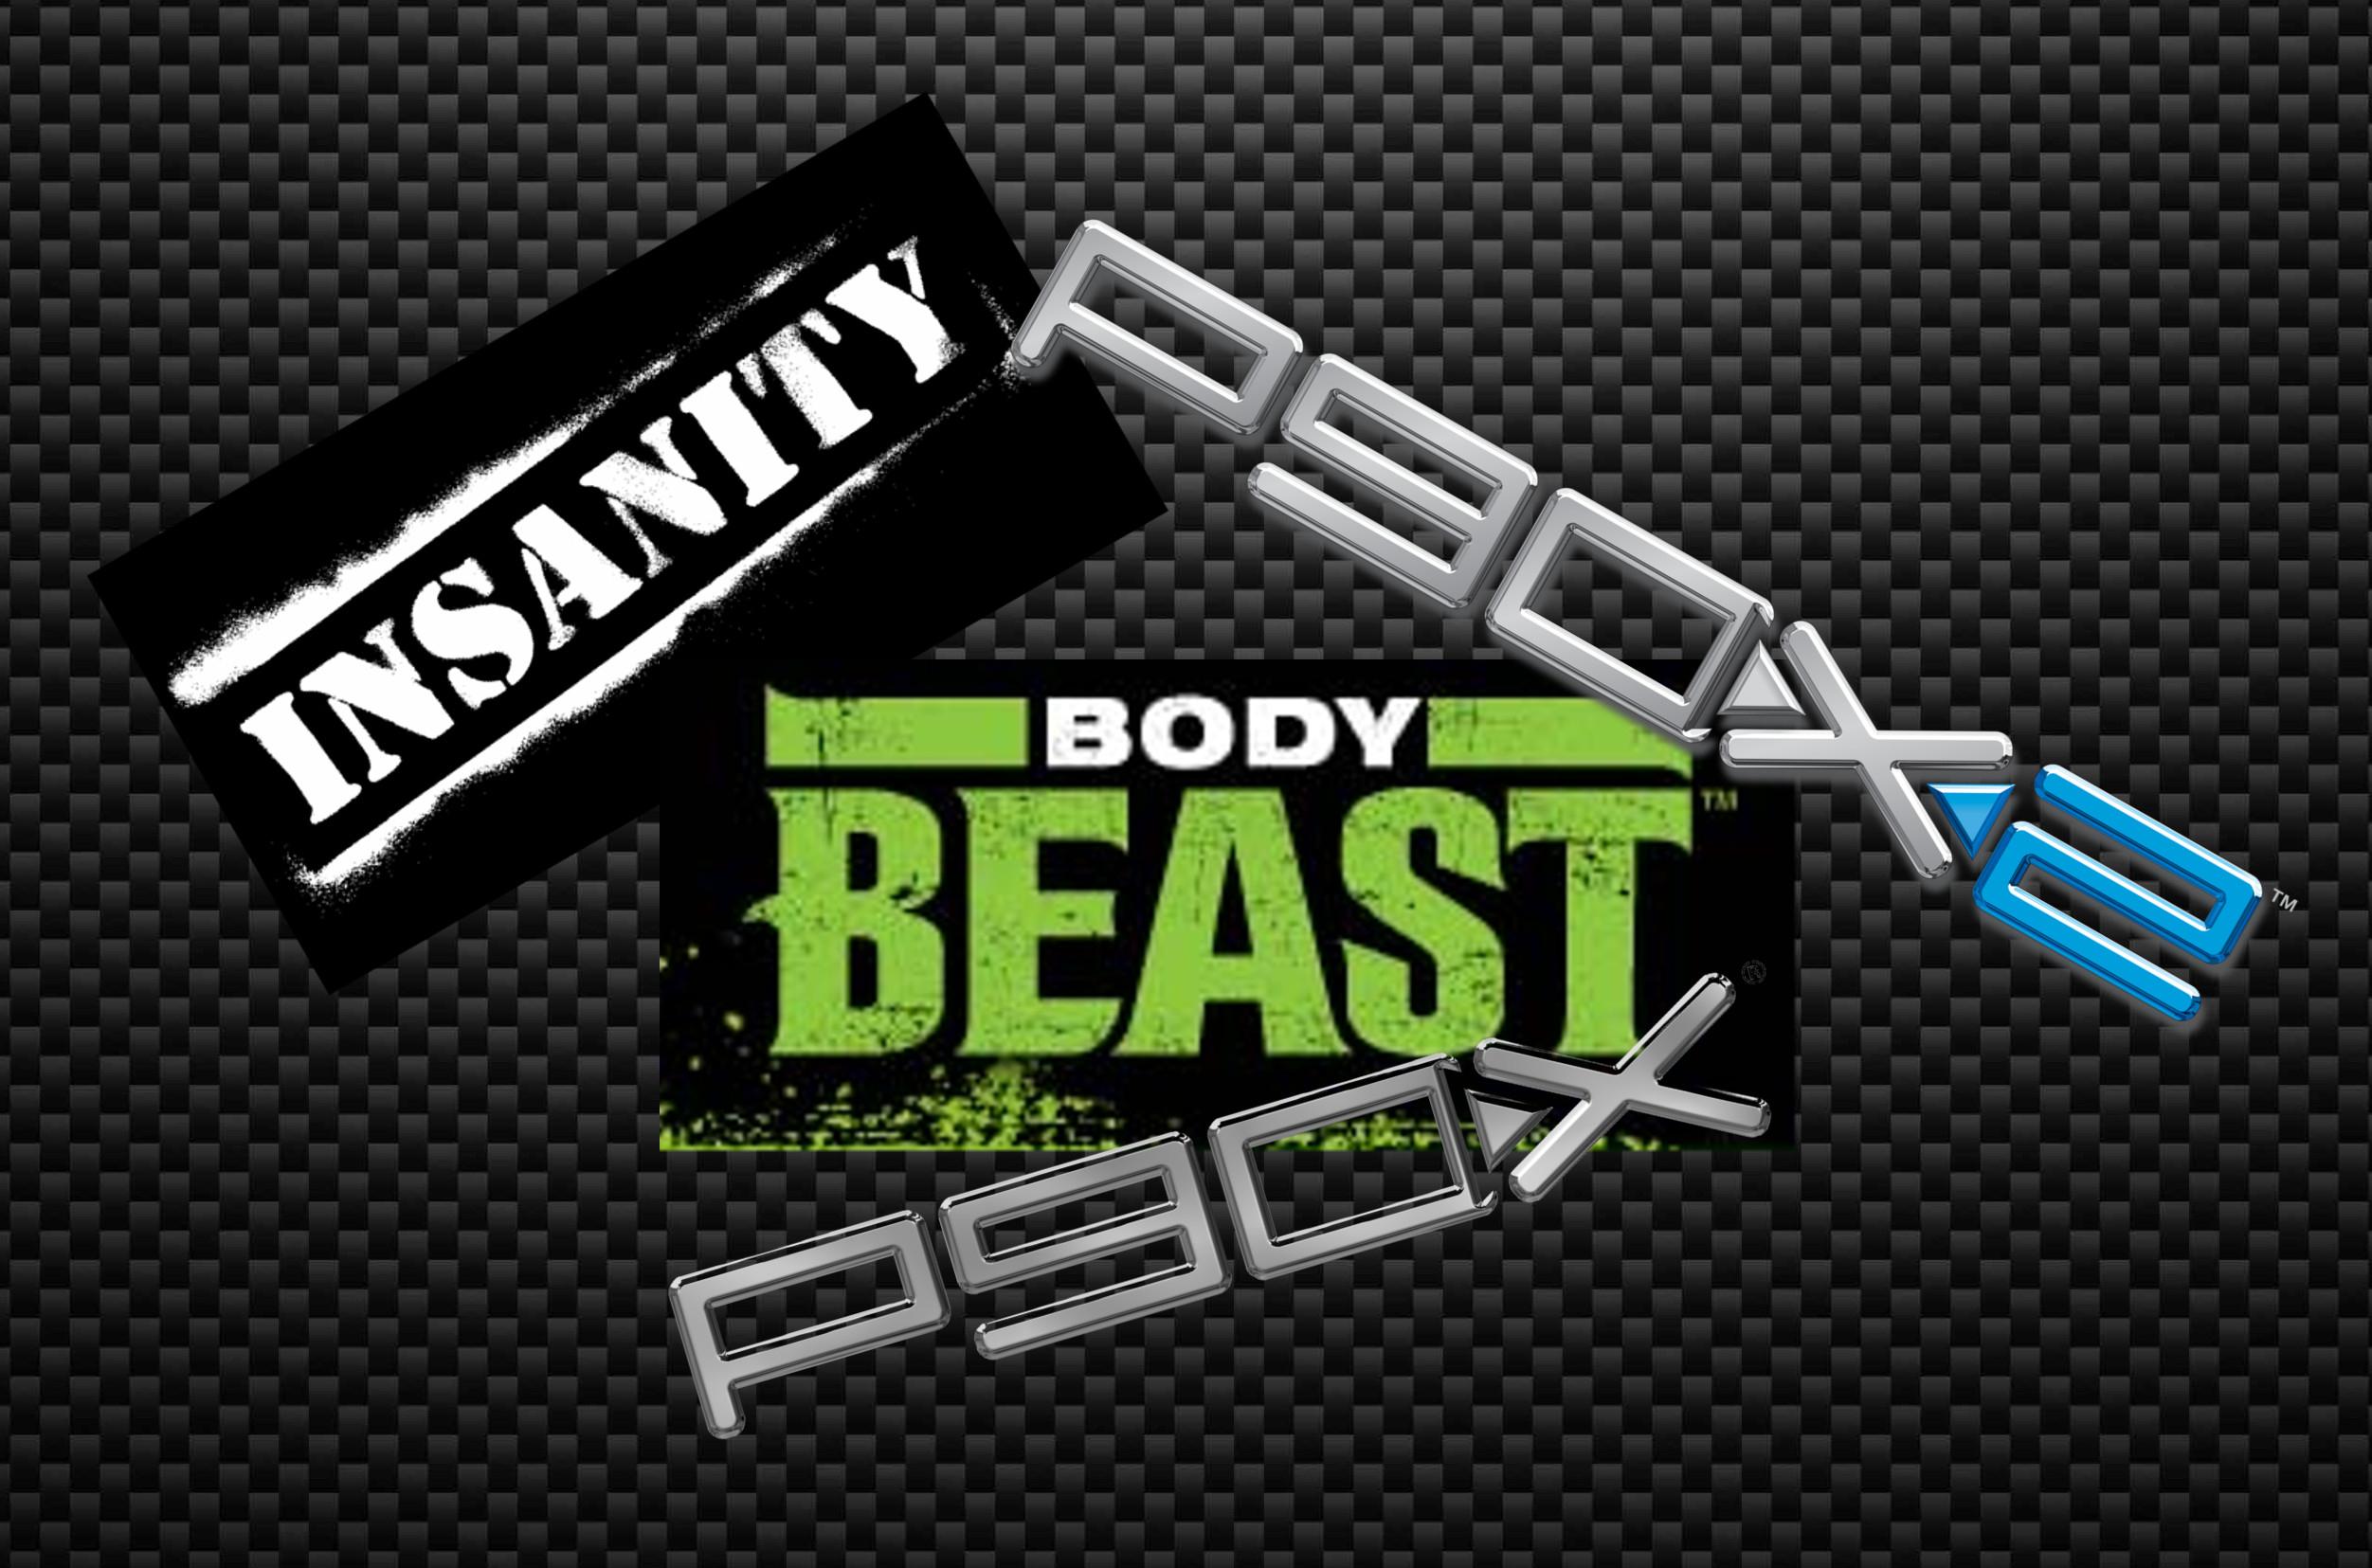 Coach Todd  My Insane X2X Body Beast Hybrid | Rippedclub for Insanity Body Beast Hybrid